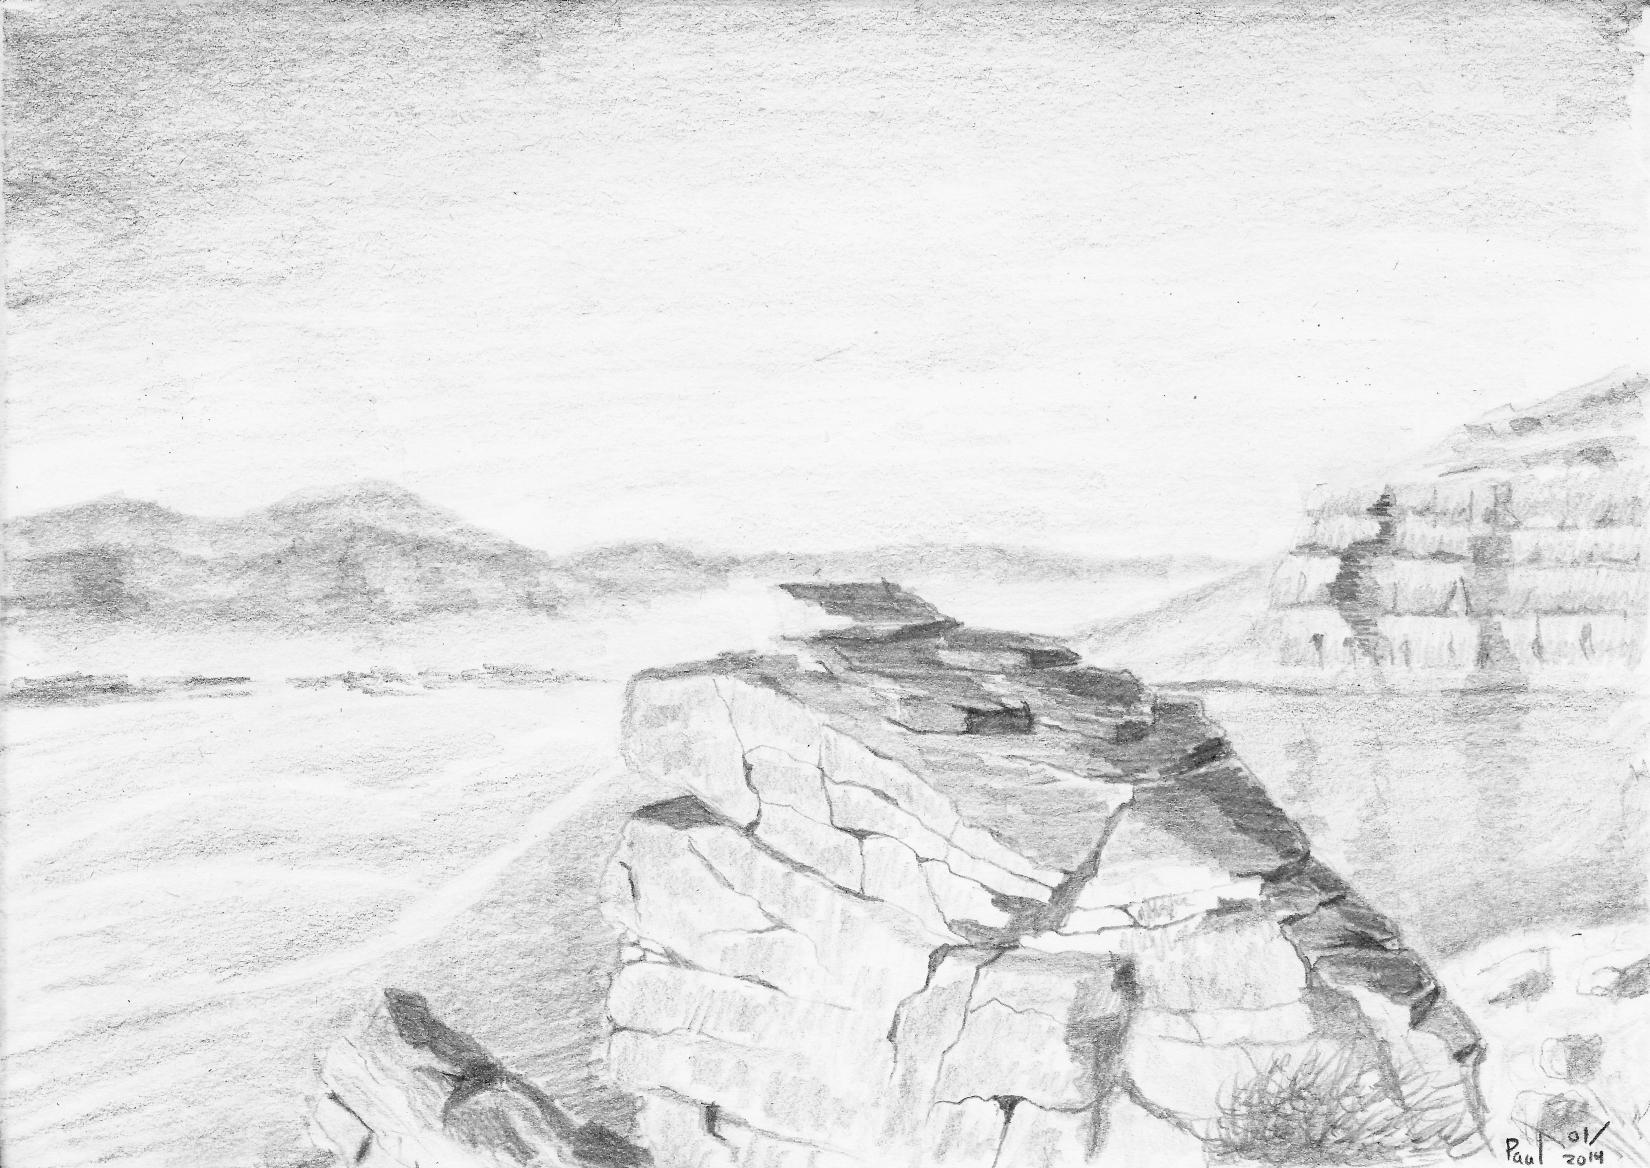 Drawn rock rocky landscape Hupie Overview Overview DeviantArt Rocky